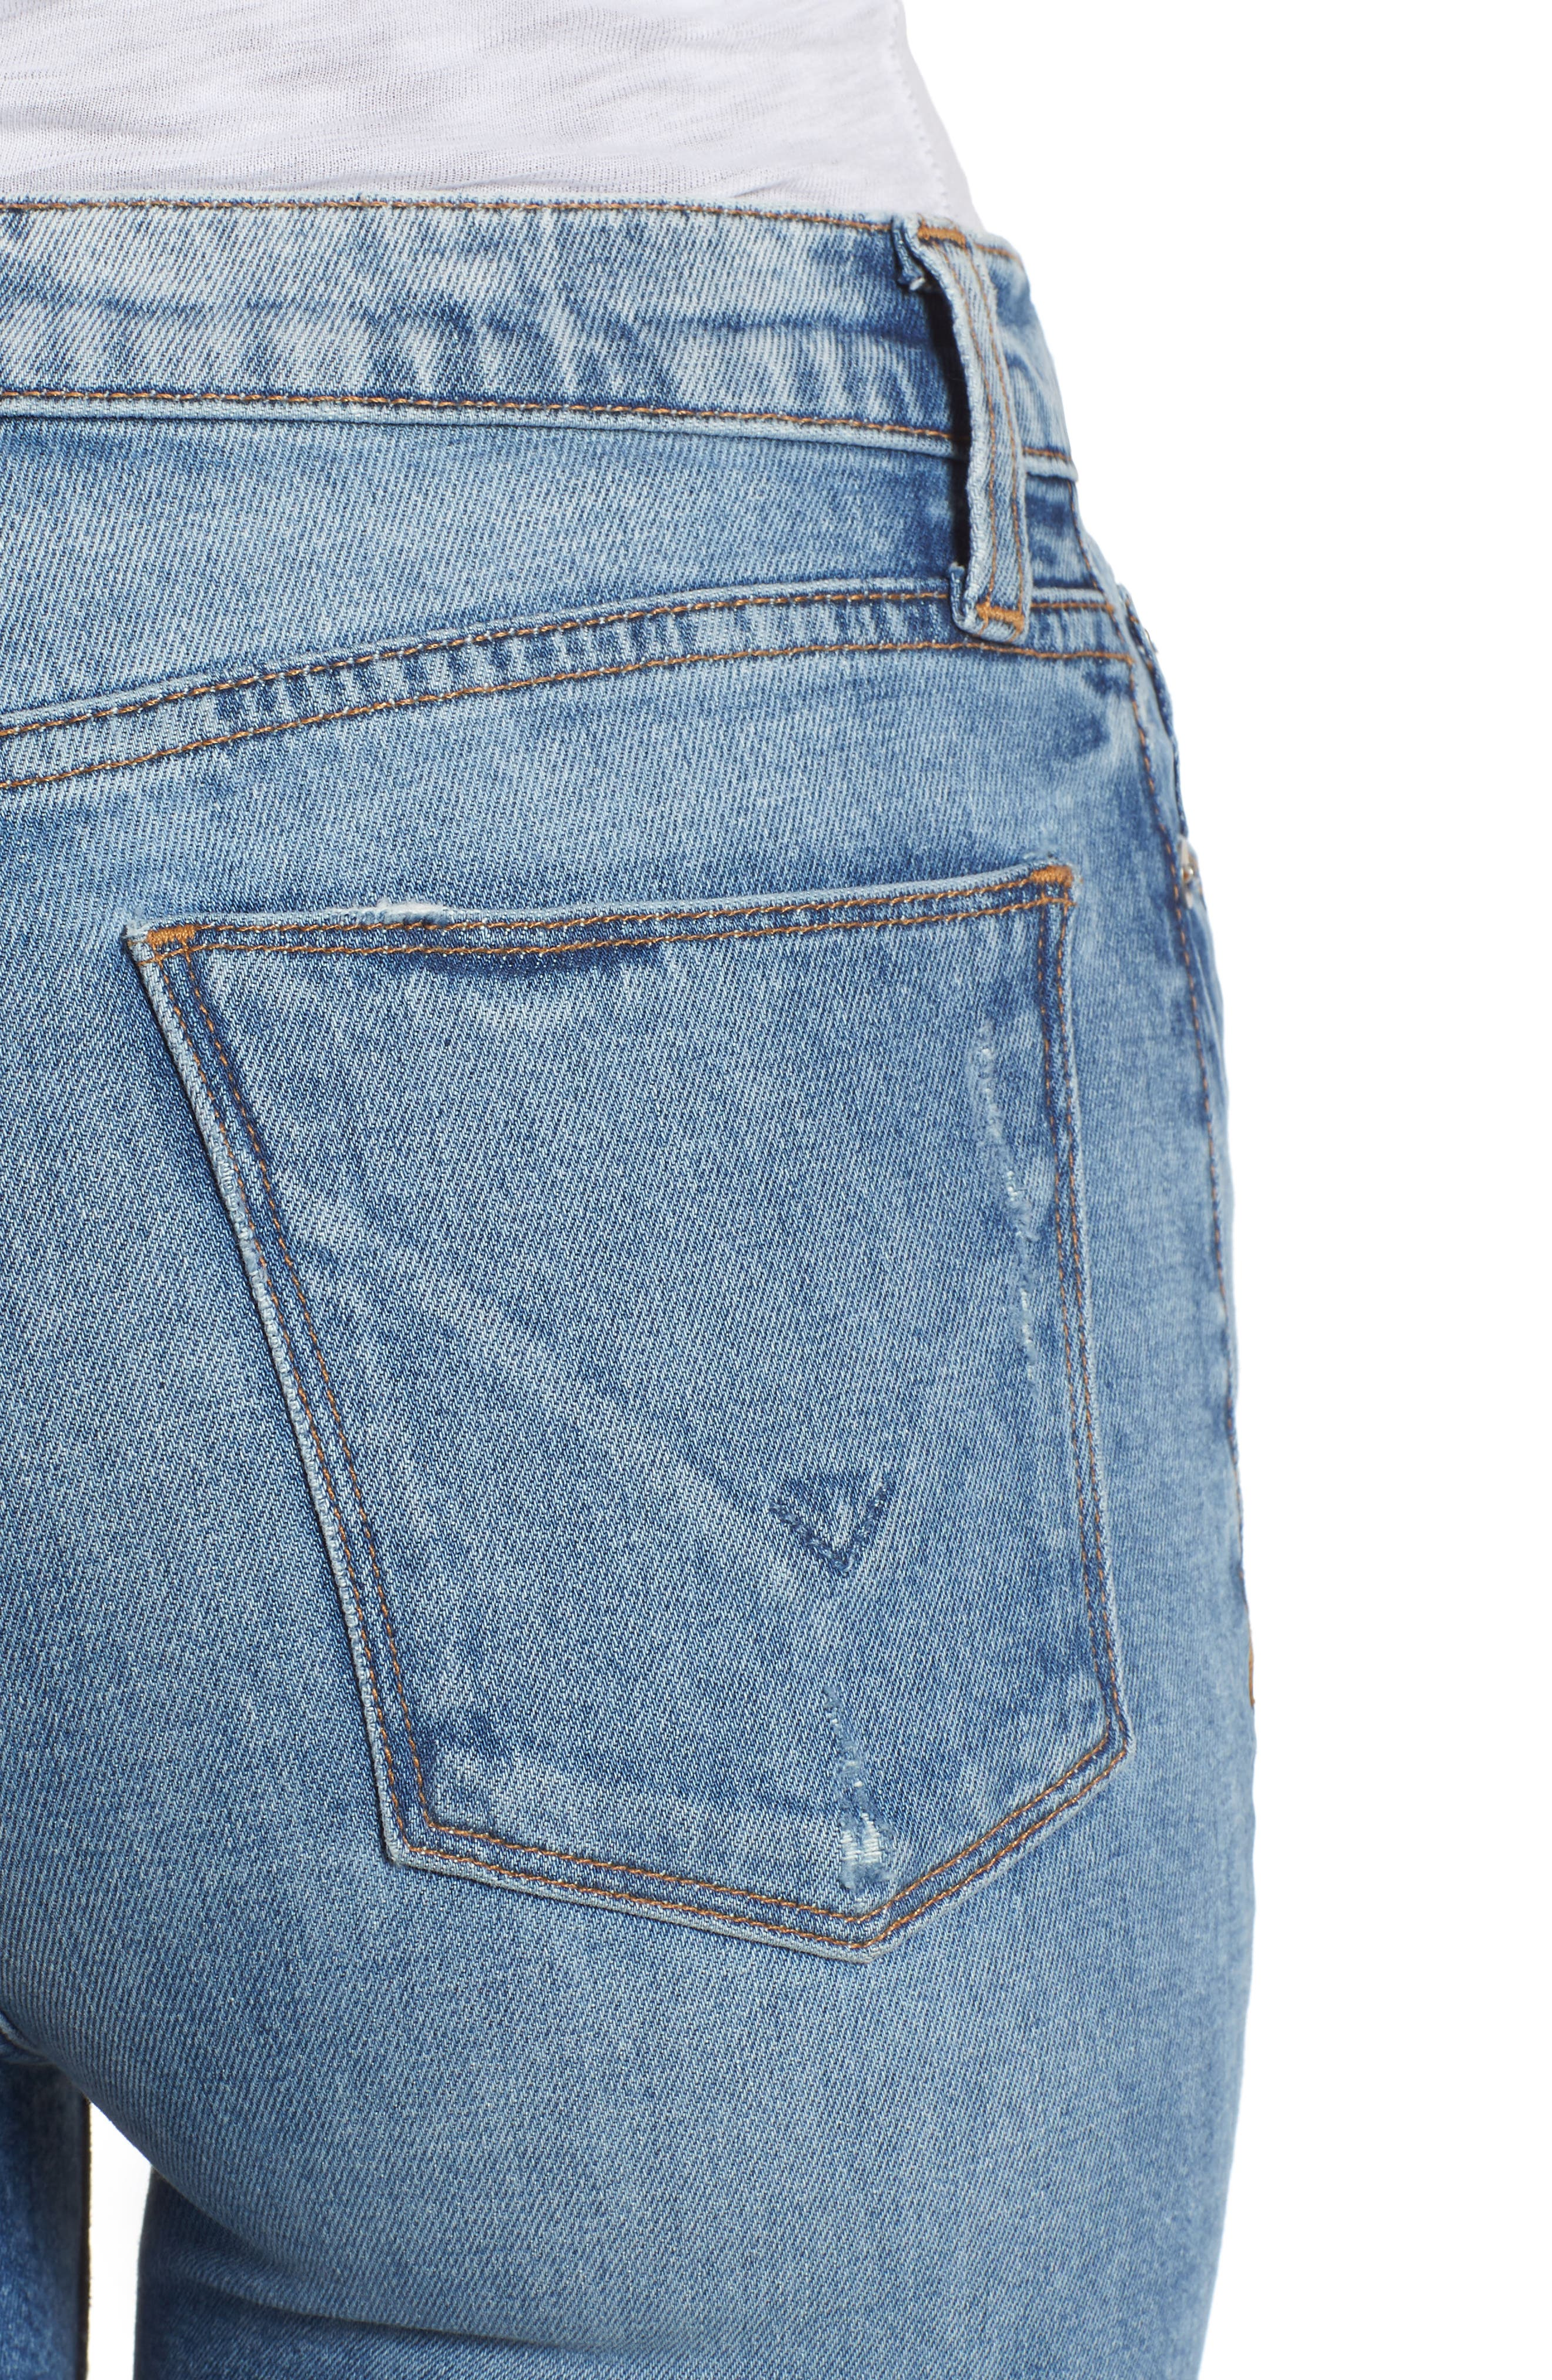 Zoeey High Waist Cutoff Boyfriend Shorts,                             Alternate thumbnail 4, color,                             JUST FOR KICKS